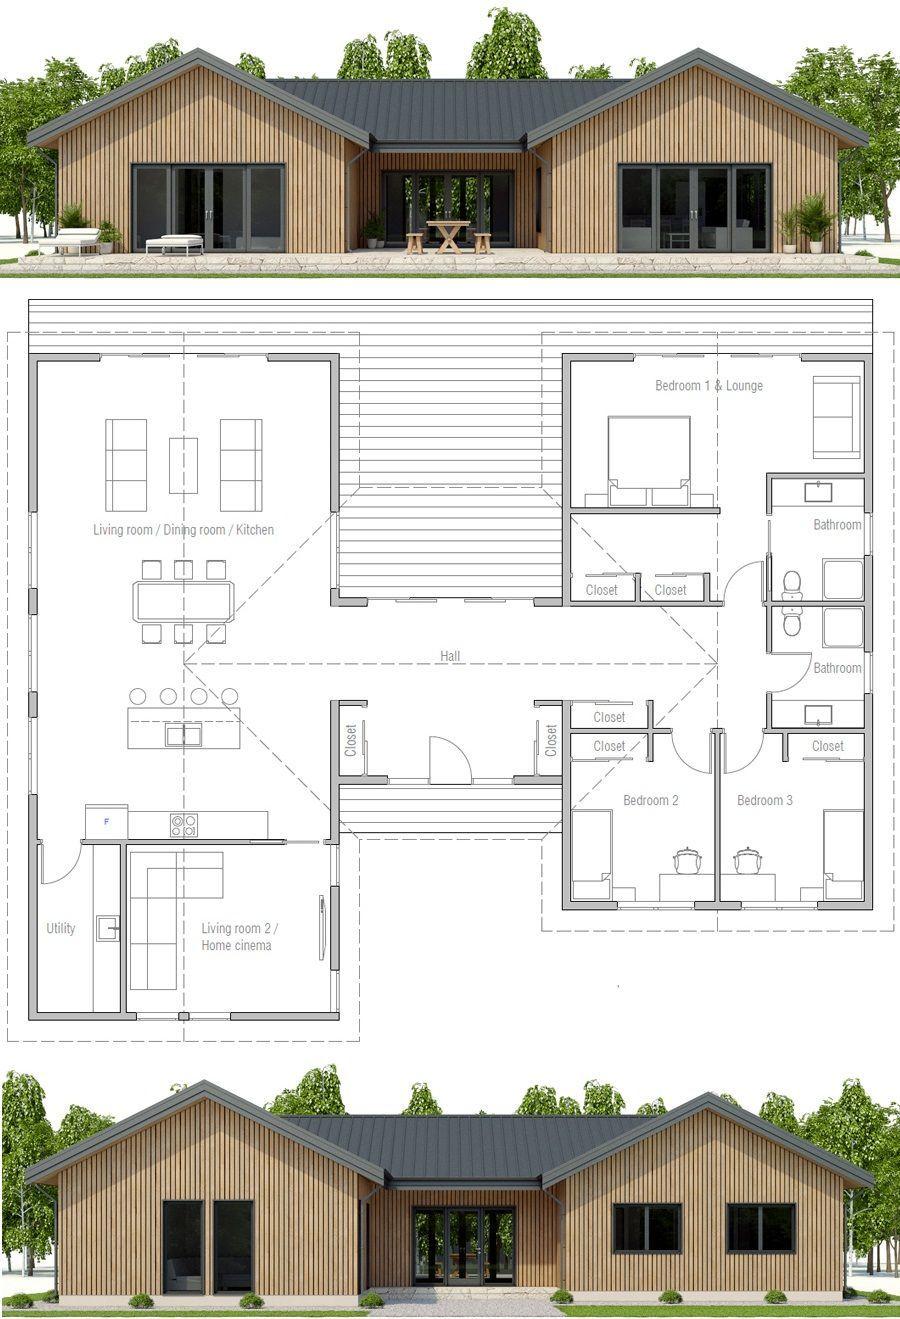 New Home Decor Design strickendesign